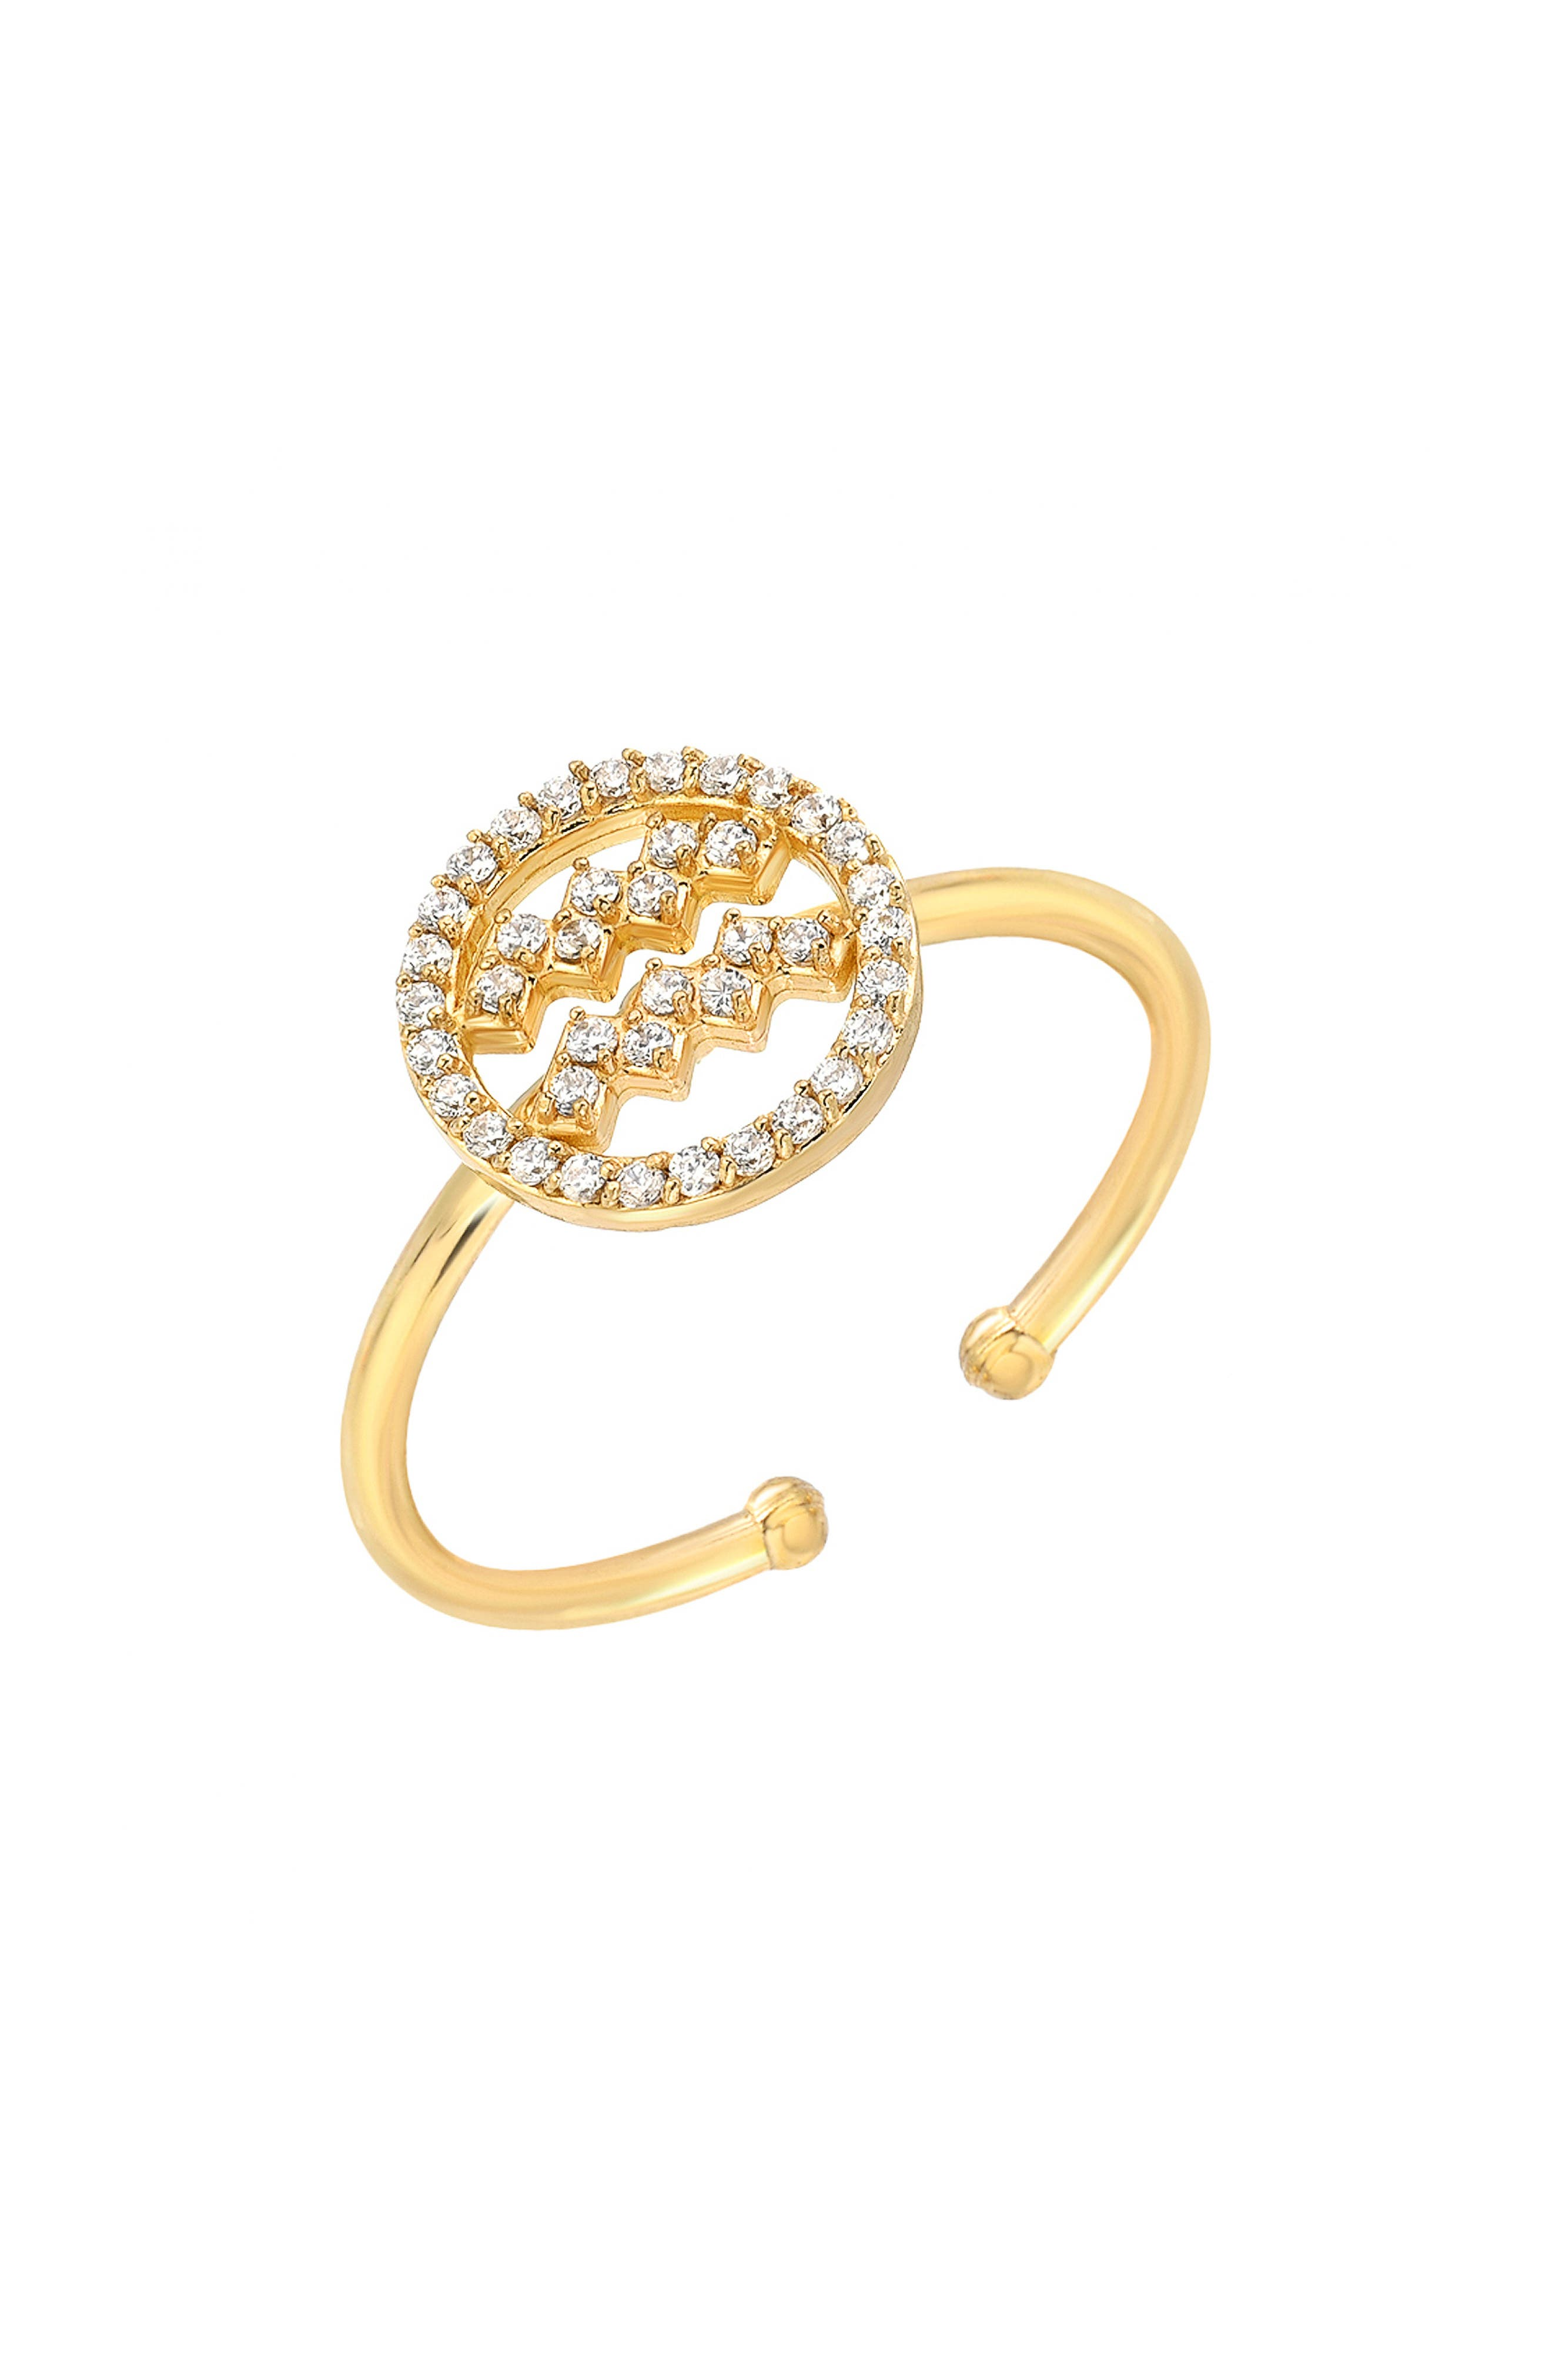 MINI MINI JEWELS, Halo Zodiac Sign Diamond Ring, Main thumbnail 1, color, YELLOW GOLD-AQUARIUS